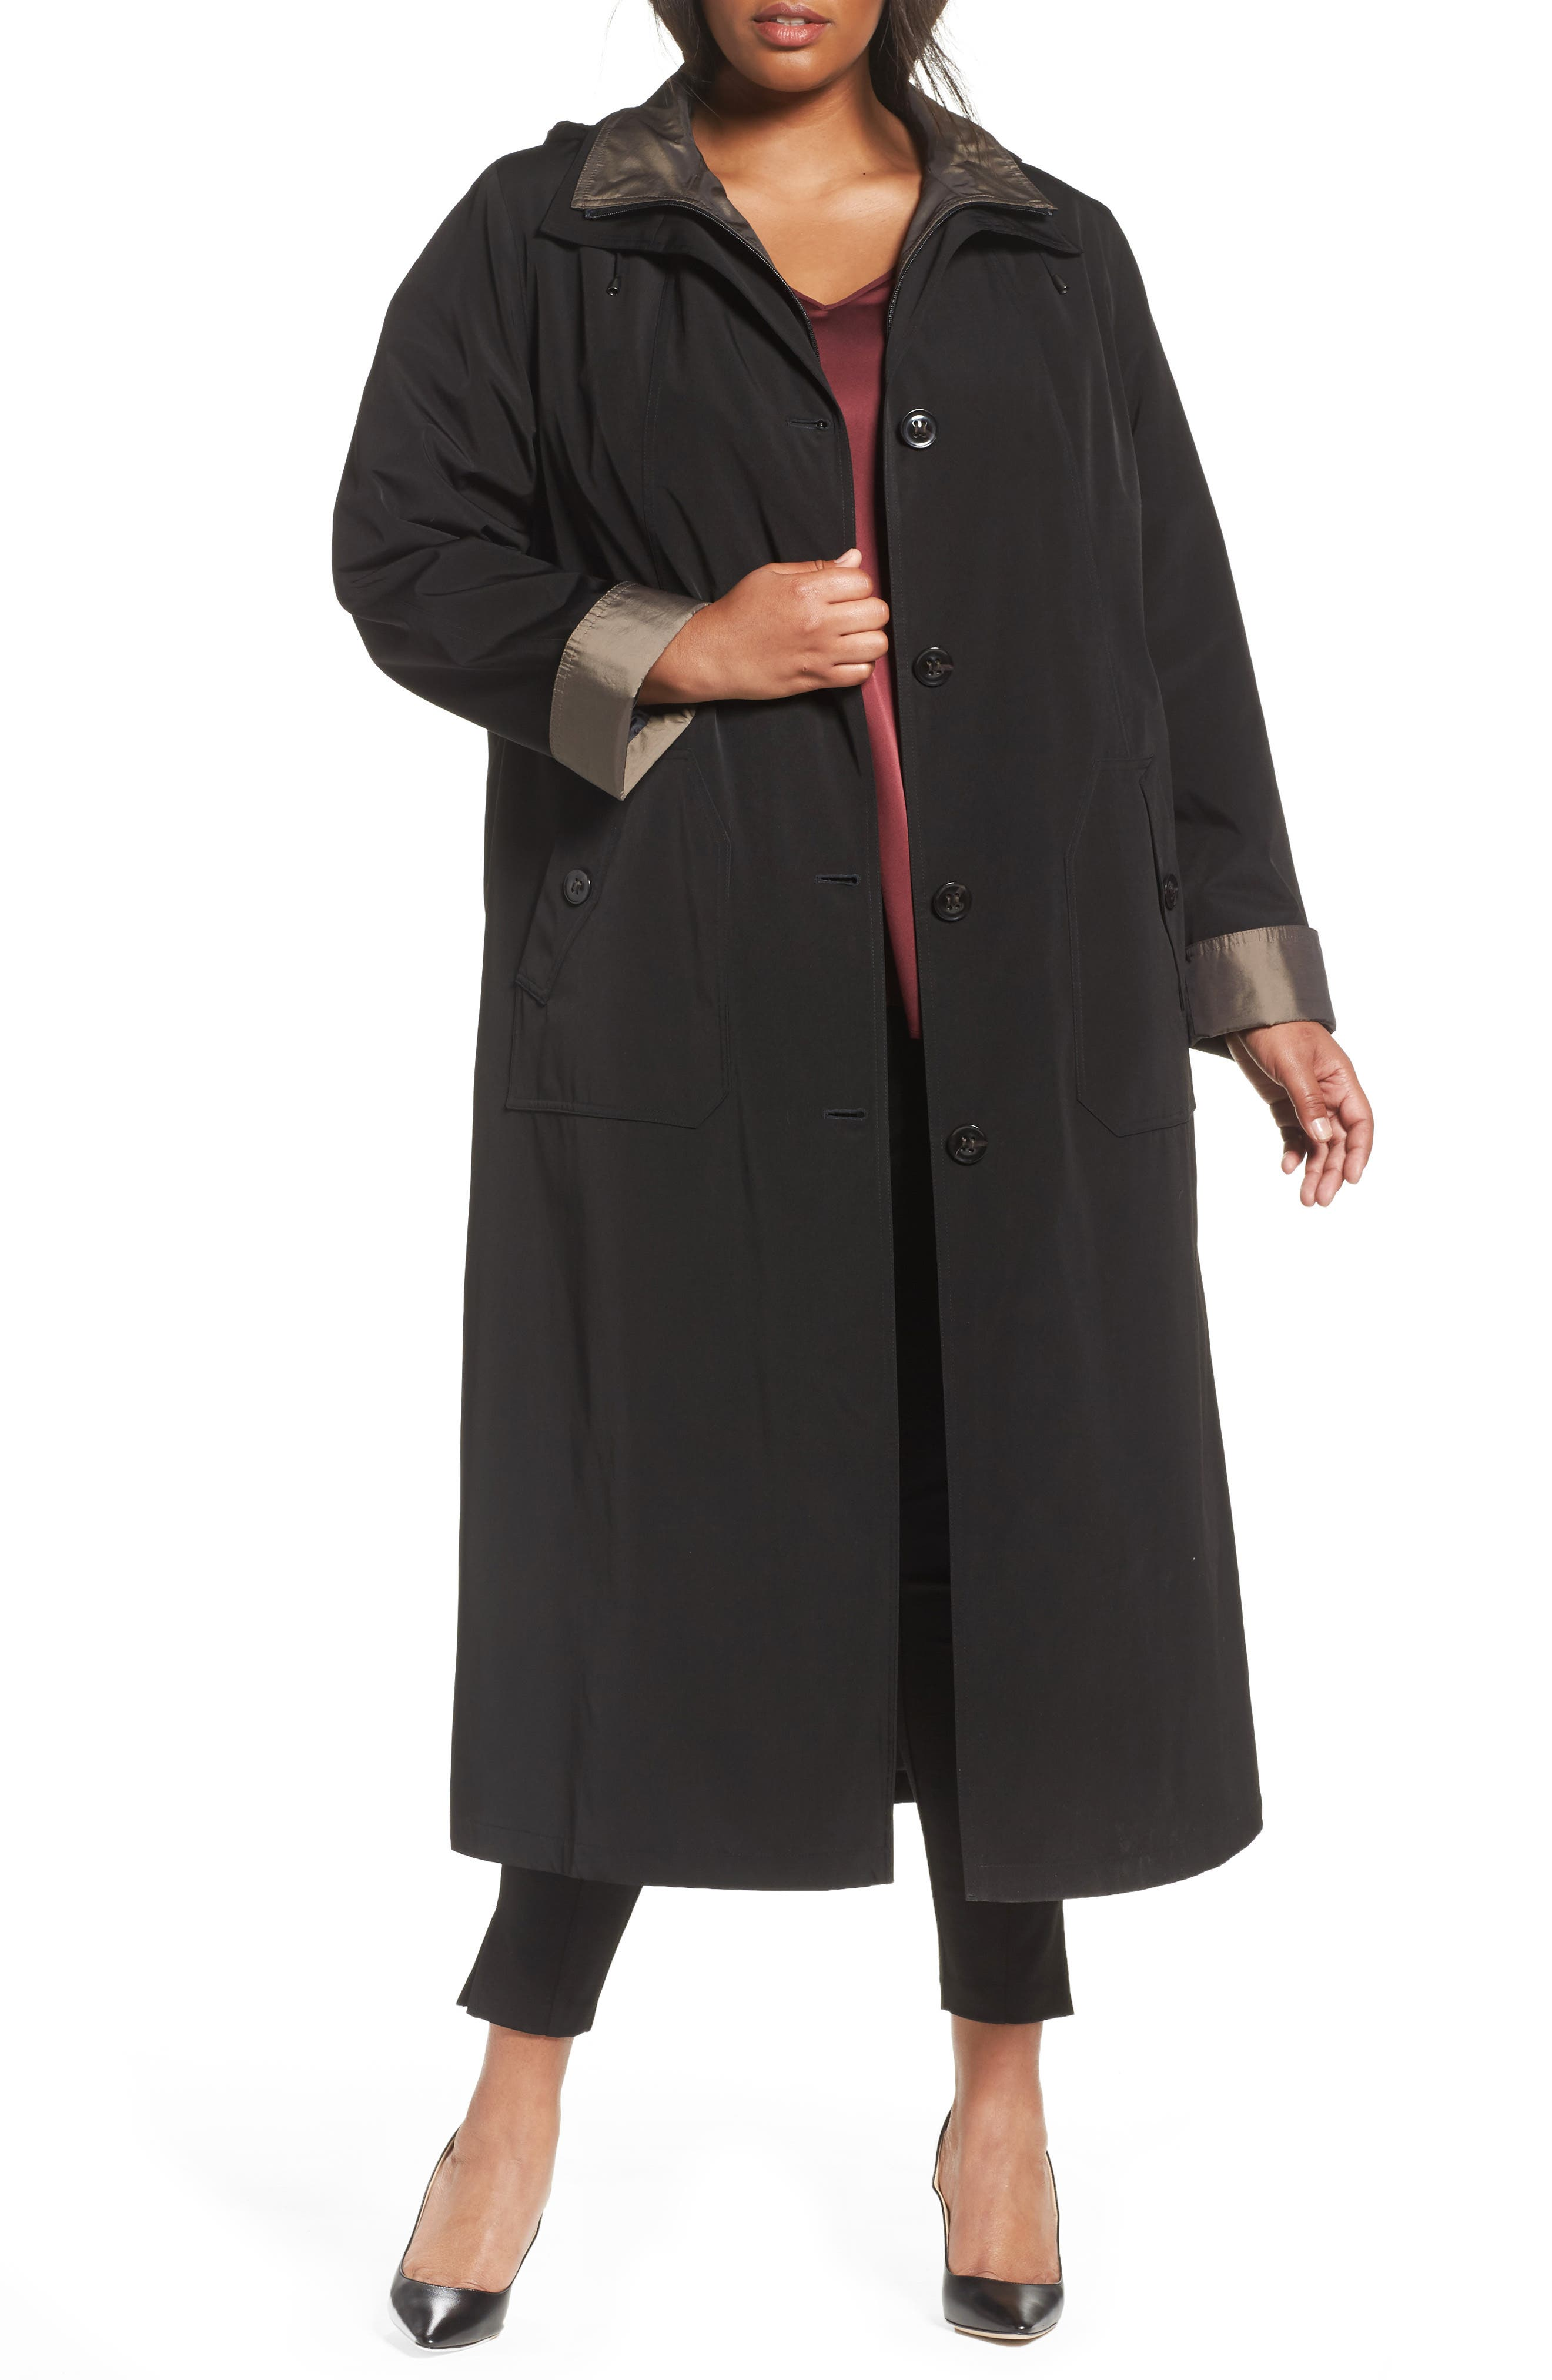 Long Raincoat with Detachable Hood & Liner,                         Main,                         color, Black / Bronze